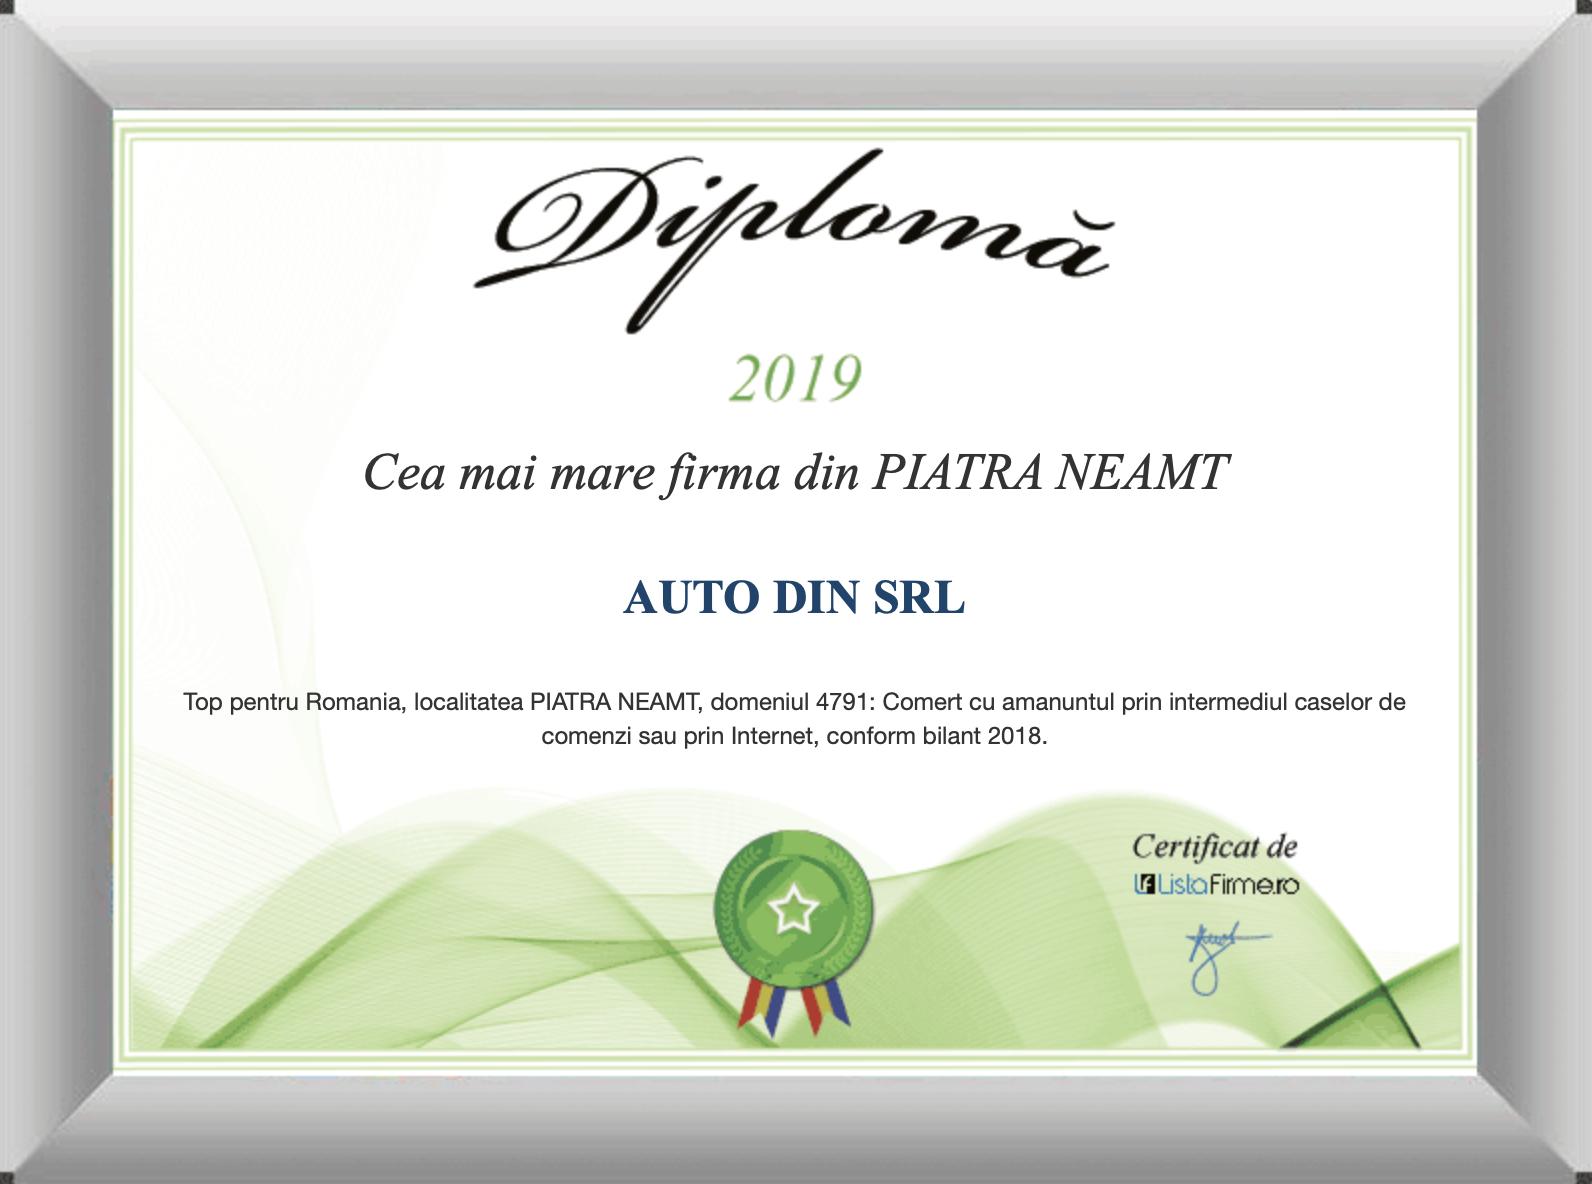 DiplomaAutoDin2019-2